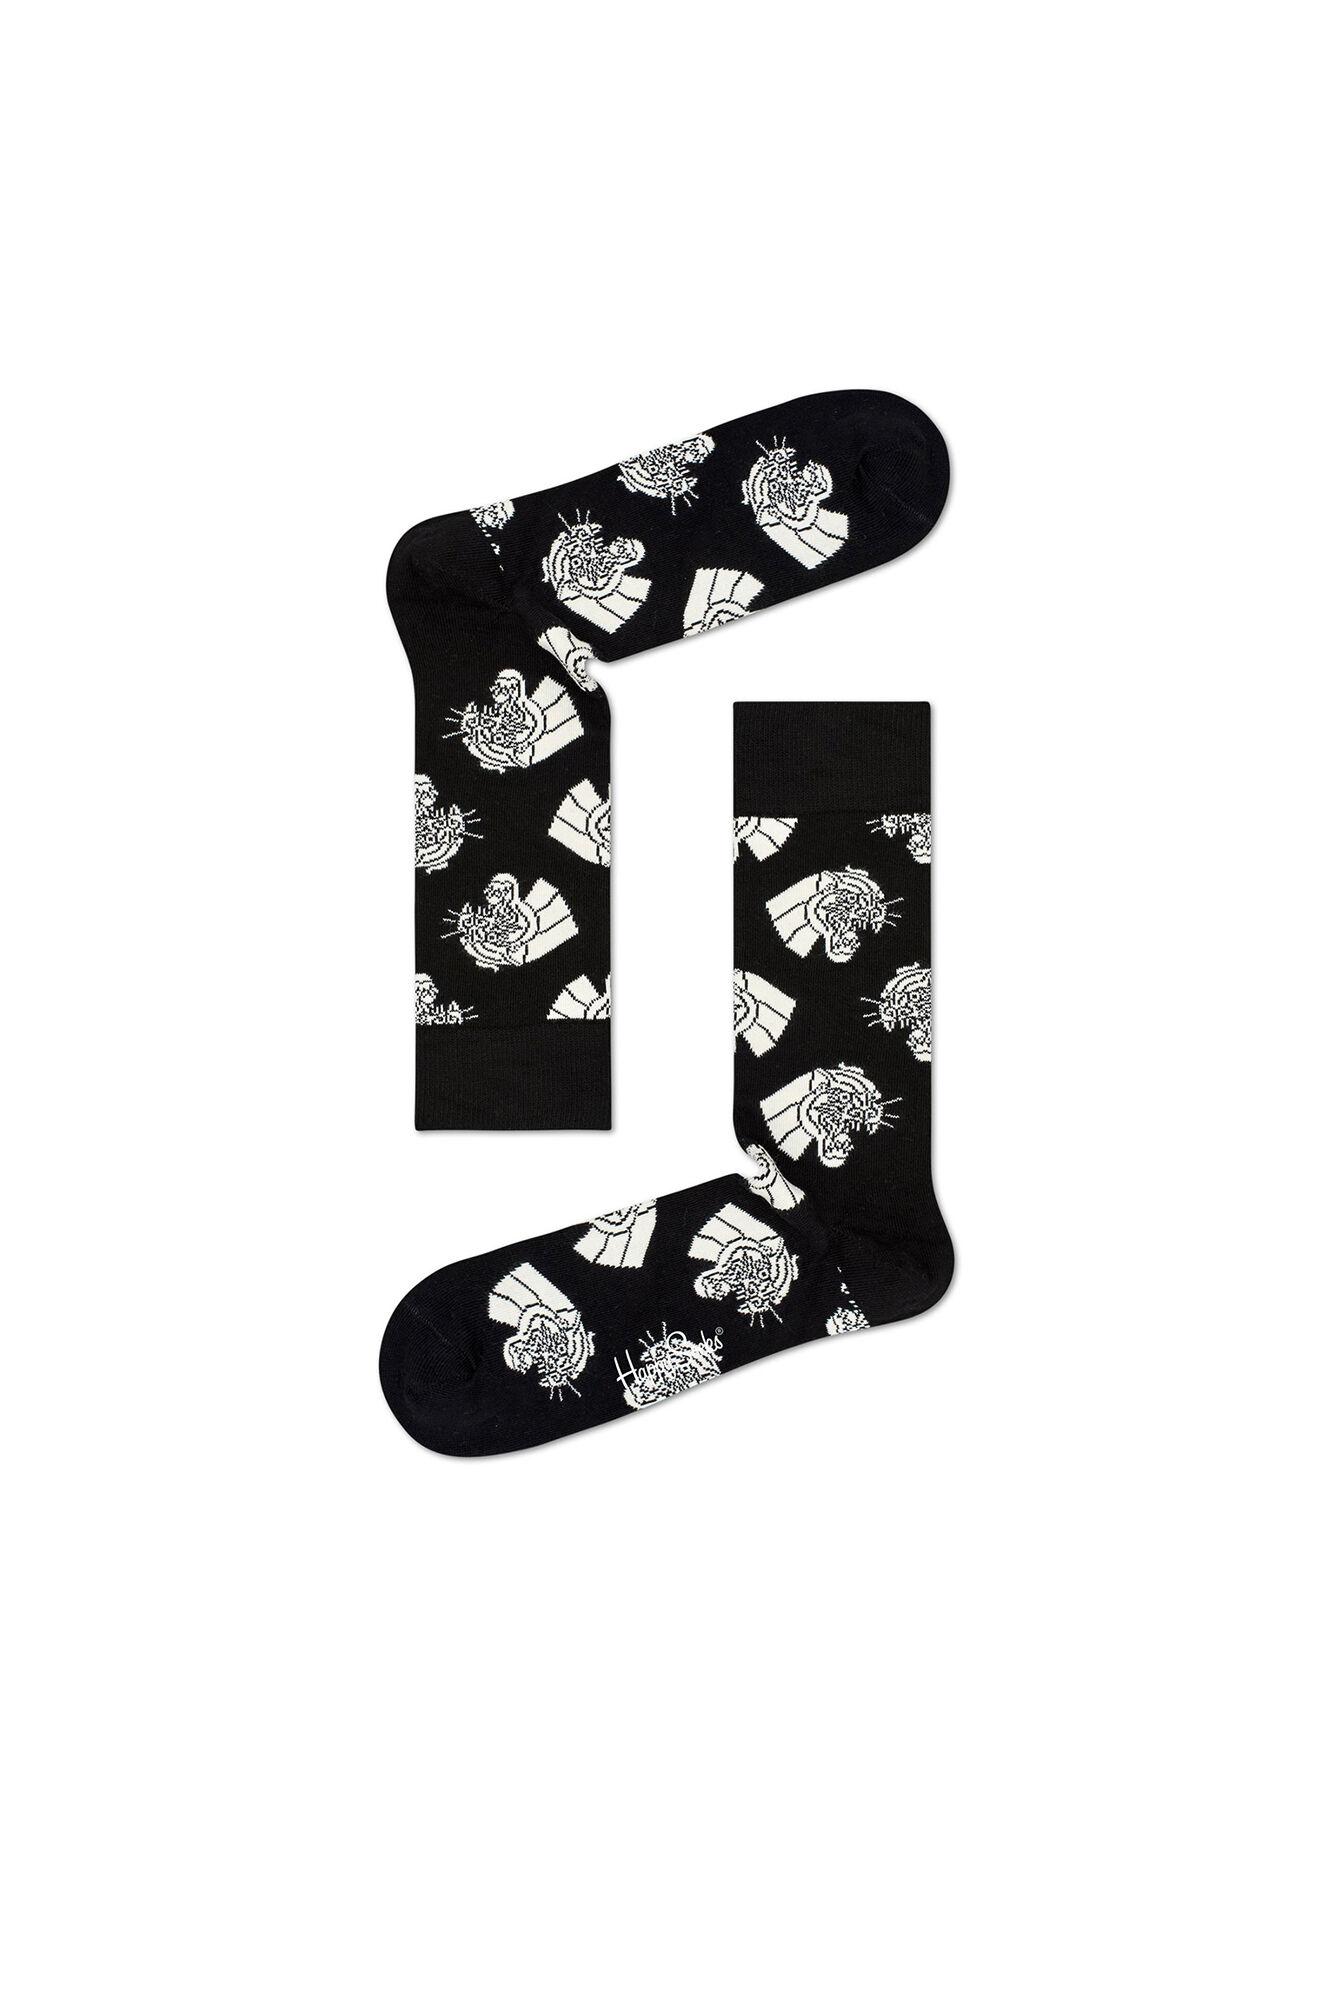 Black & White Gift Box XBLW09, 9003